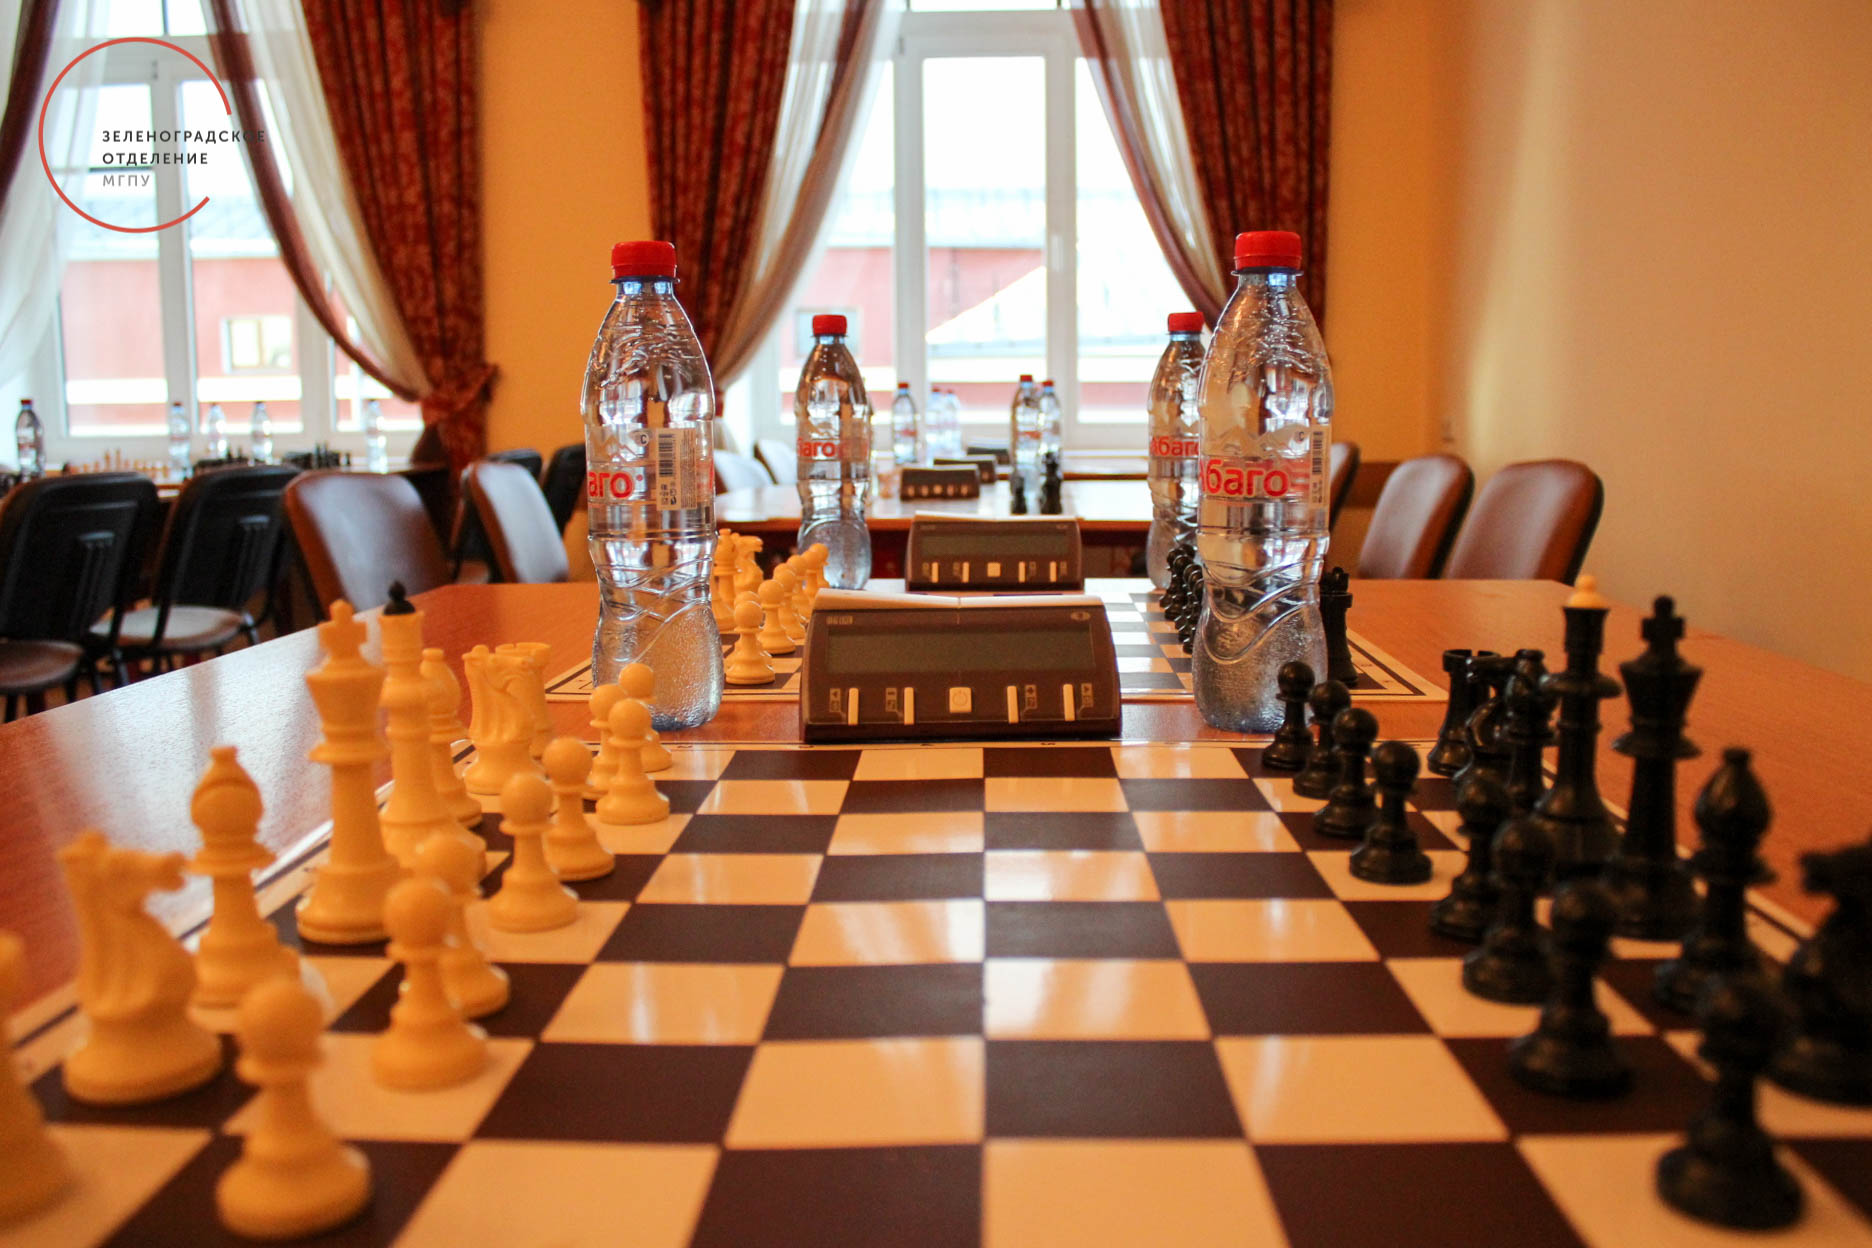 Январские шахматные турниры Анатолия Карпова